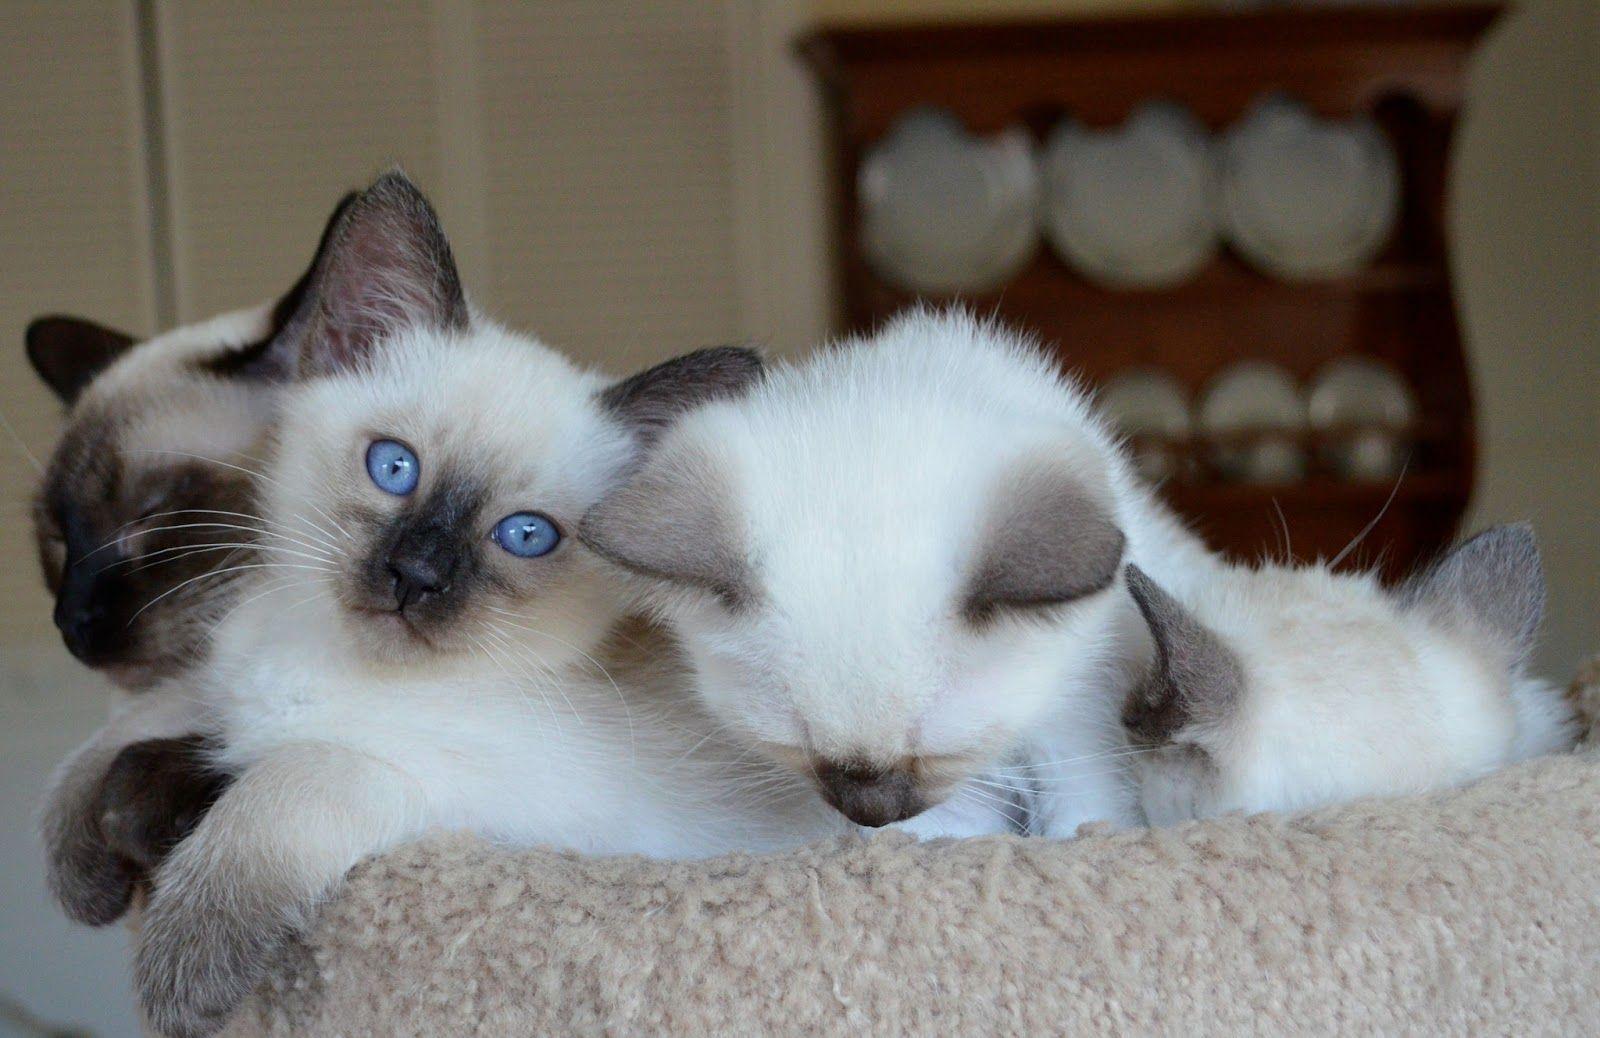 siamese cat wallpaper hd | Siamese cat wallpaper | Pinterest | Cat ...